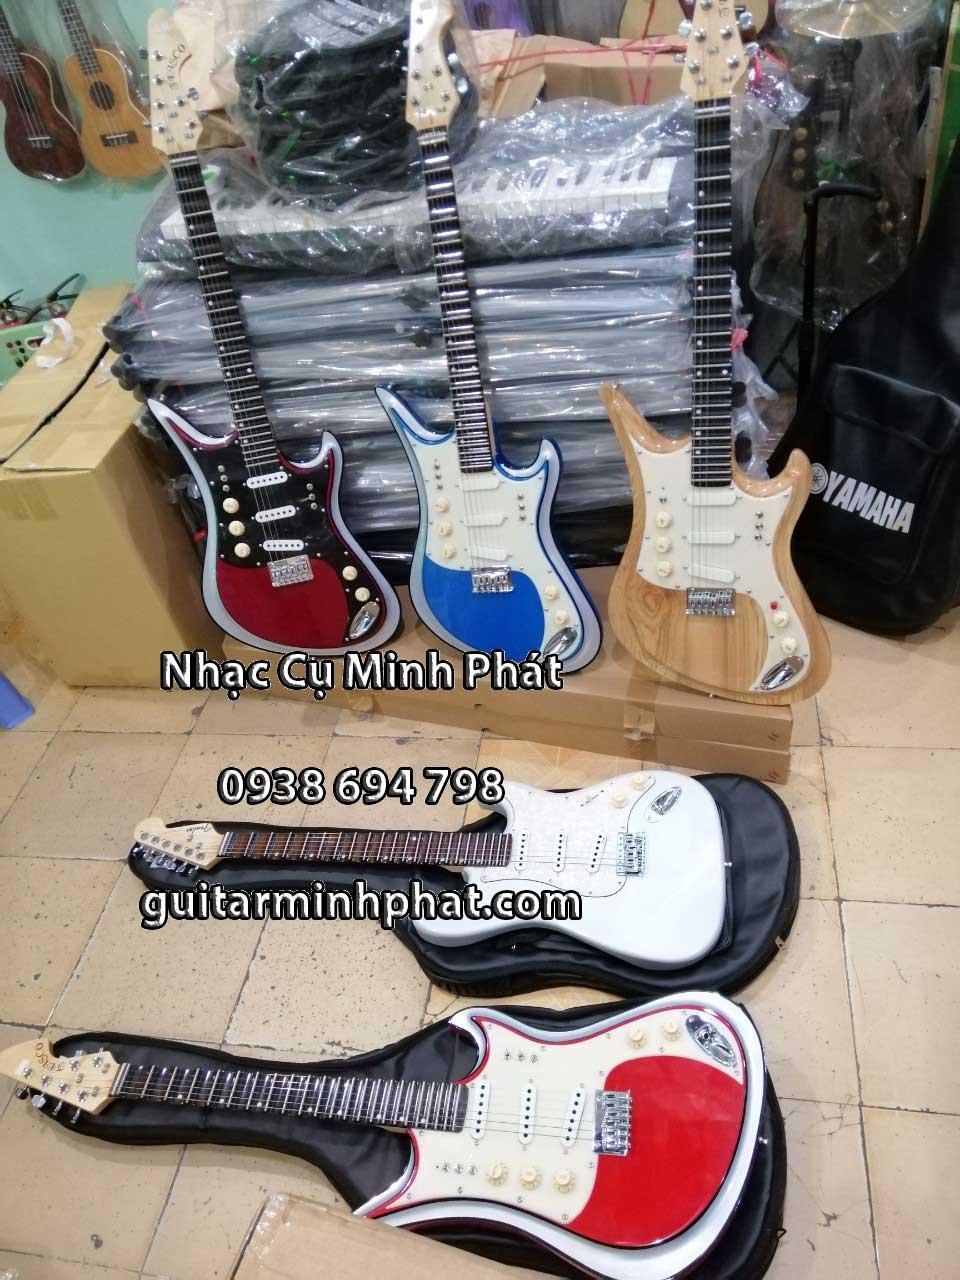 shop-ban-dan-guitar-vong-co-tai-tphcm